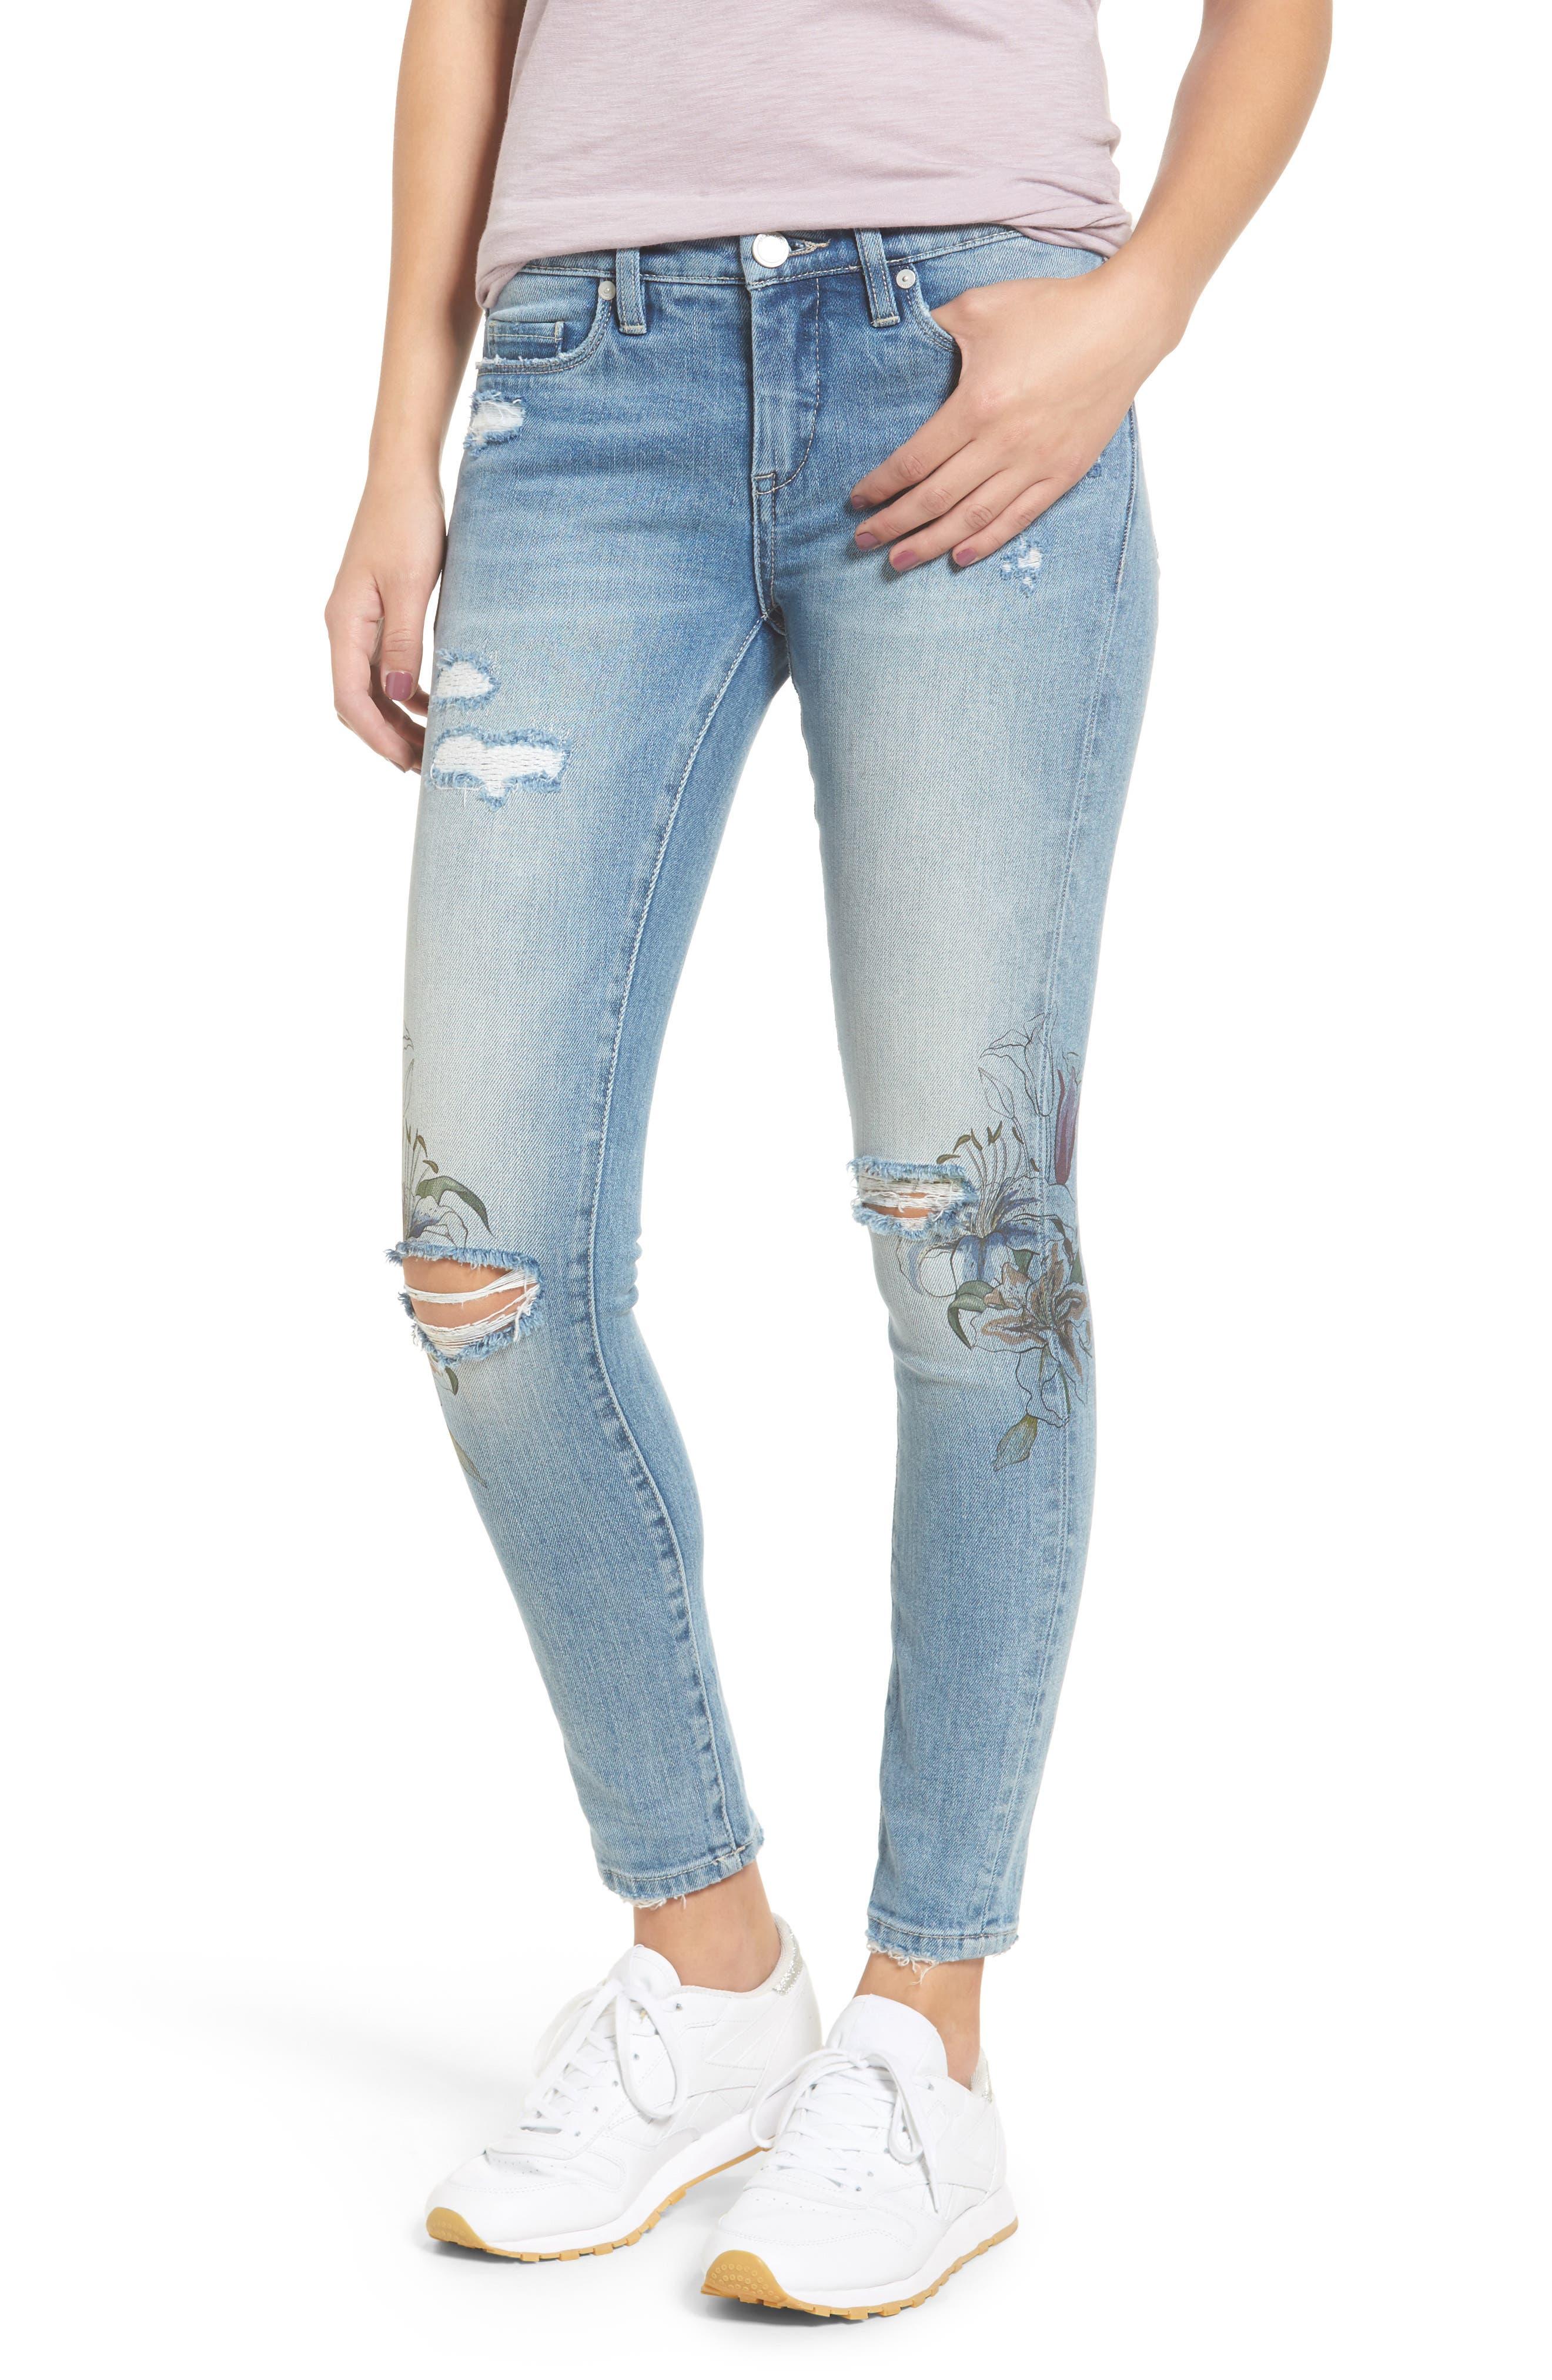 Main Image - BLANKNYC Print Ripped Skinny Jeans (Goin Digital)